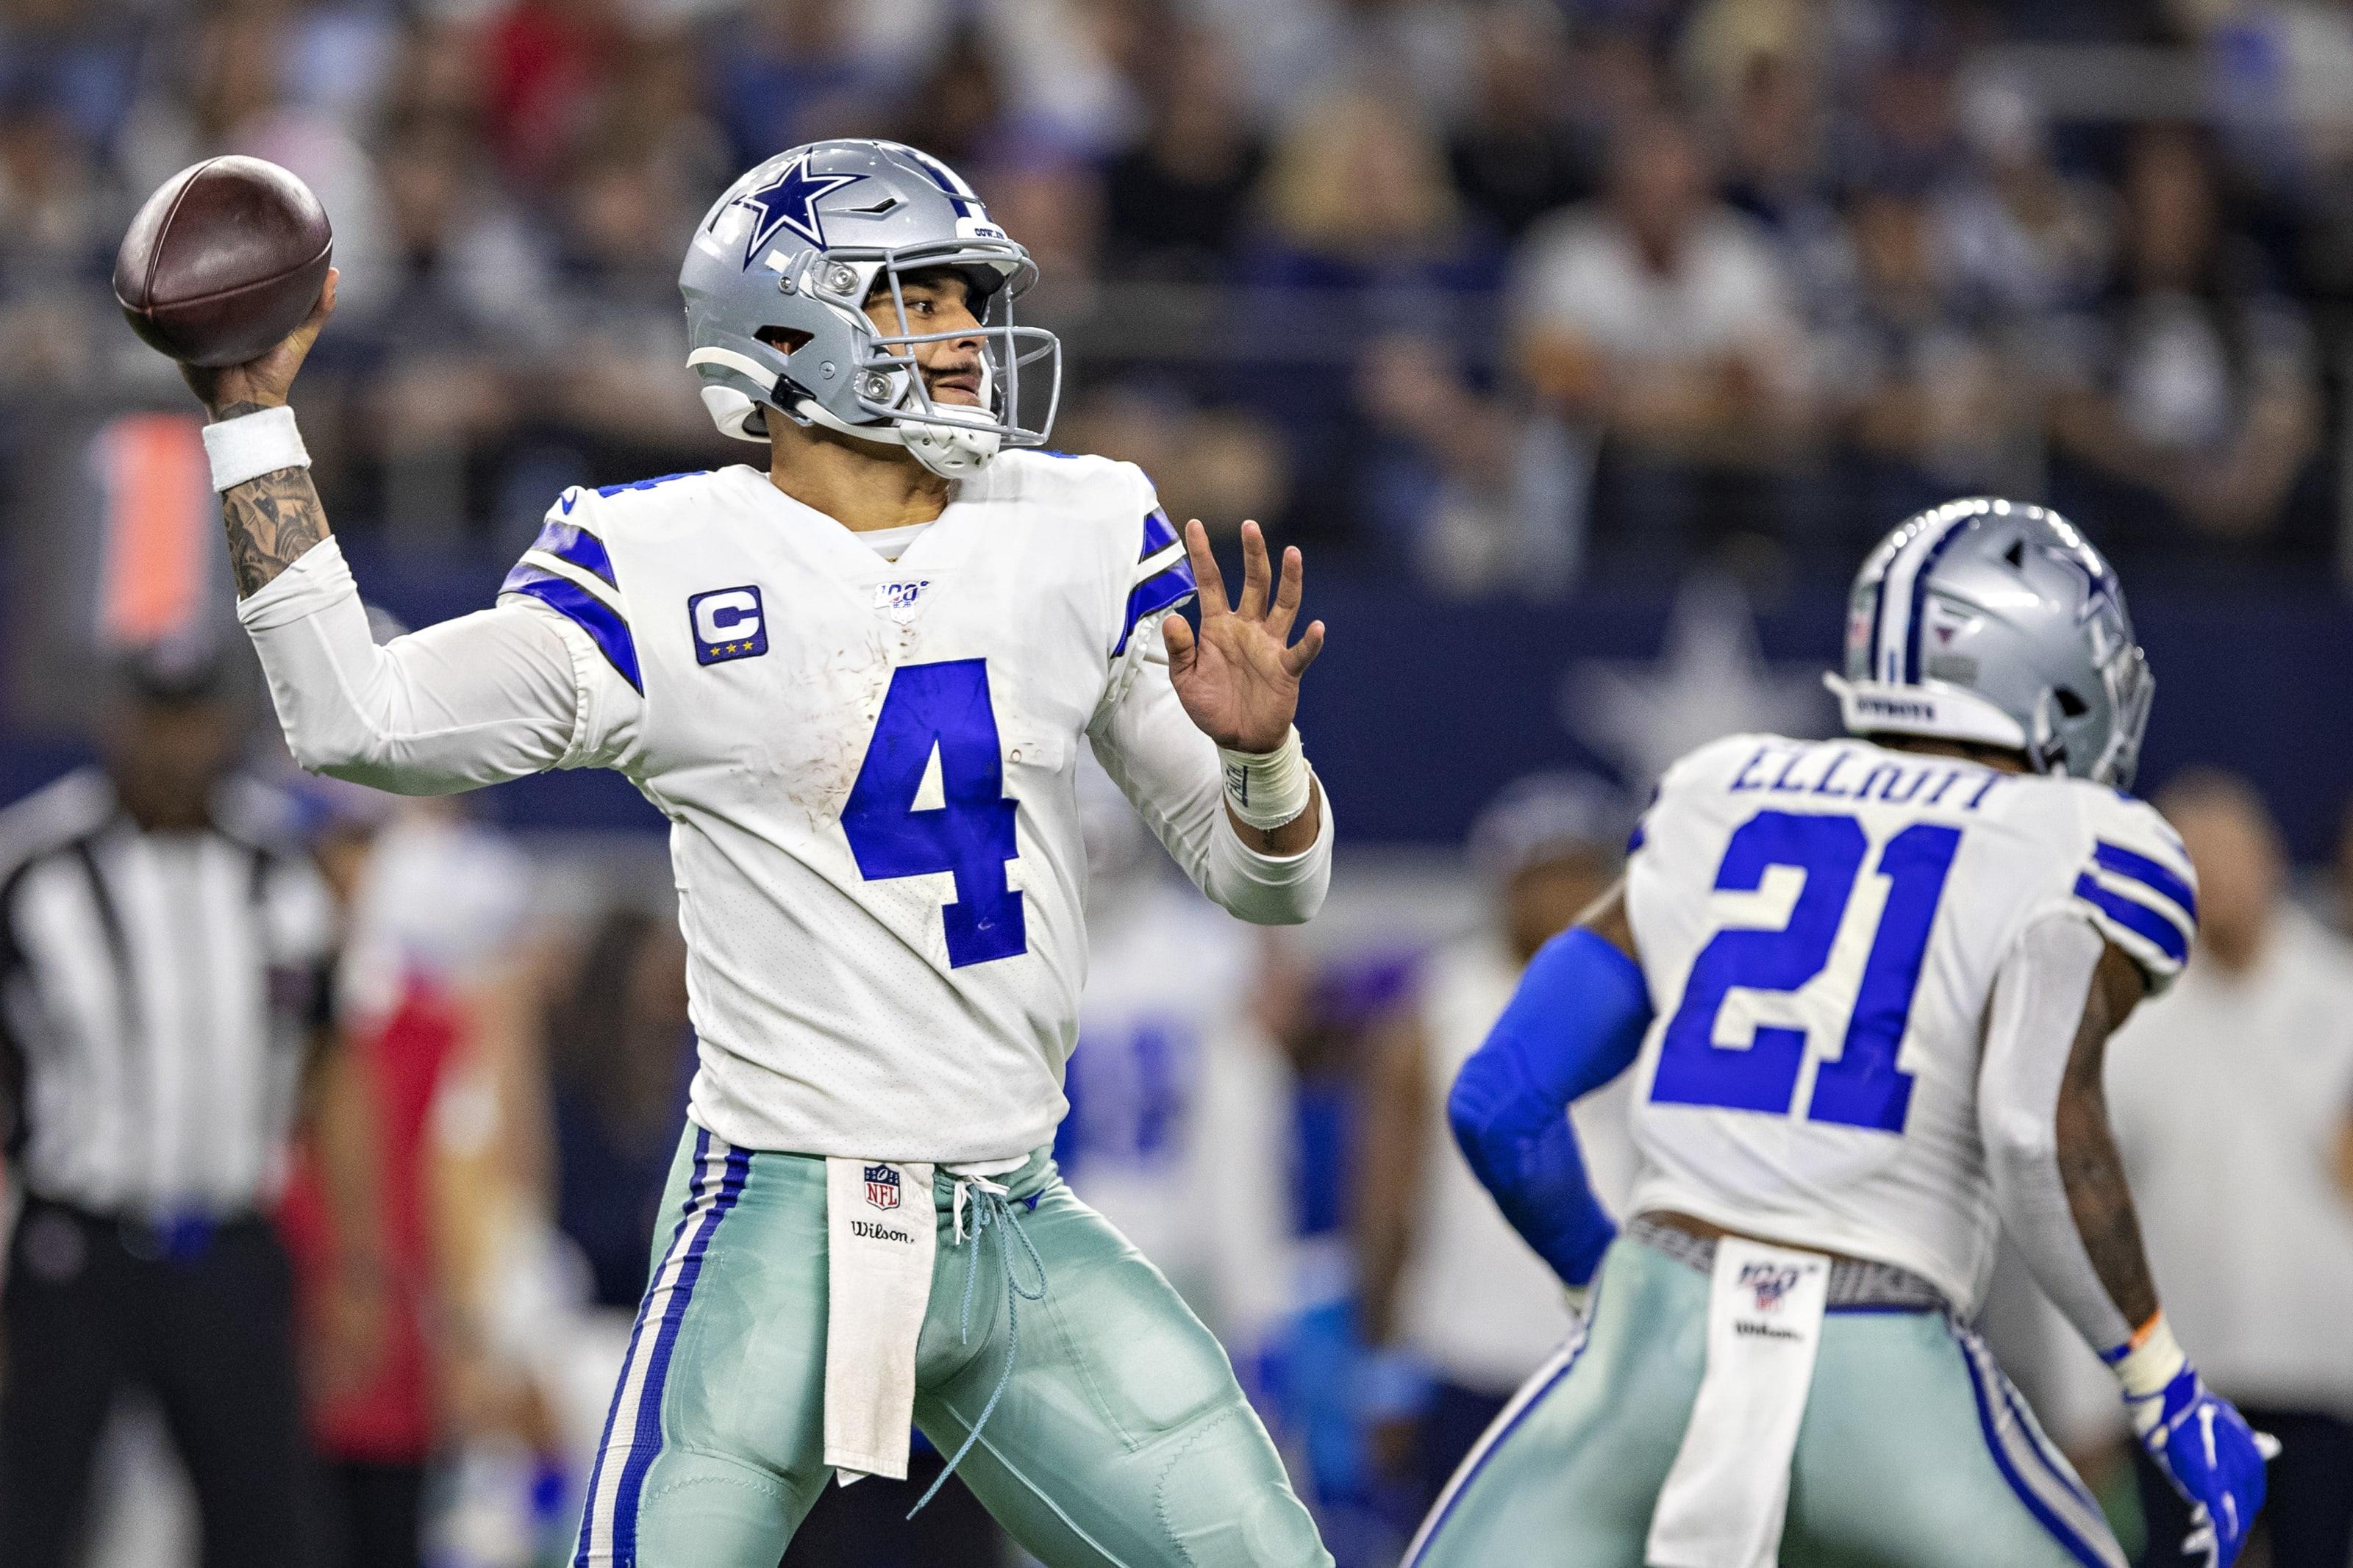 Dak Prescott #4 of the Dallas Cowboys